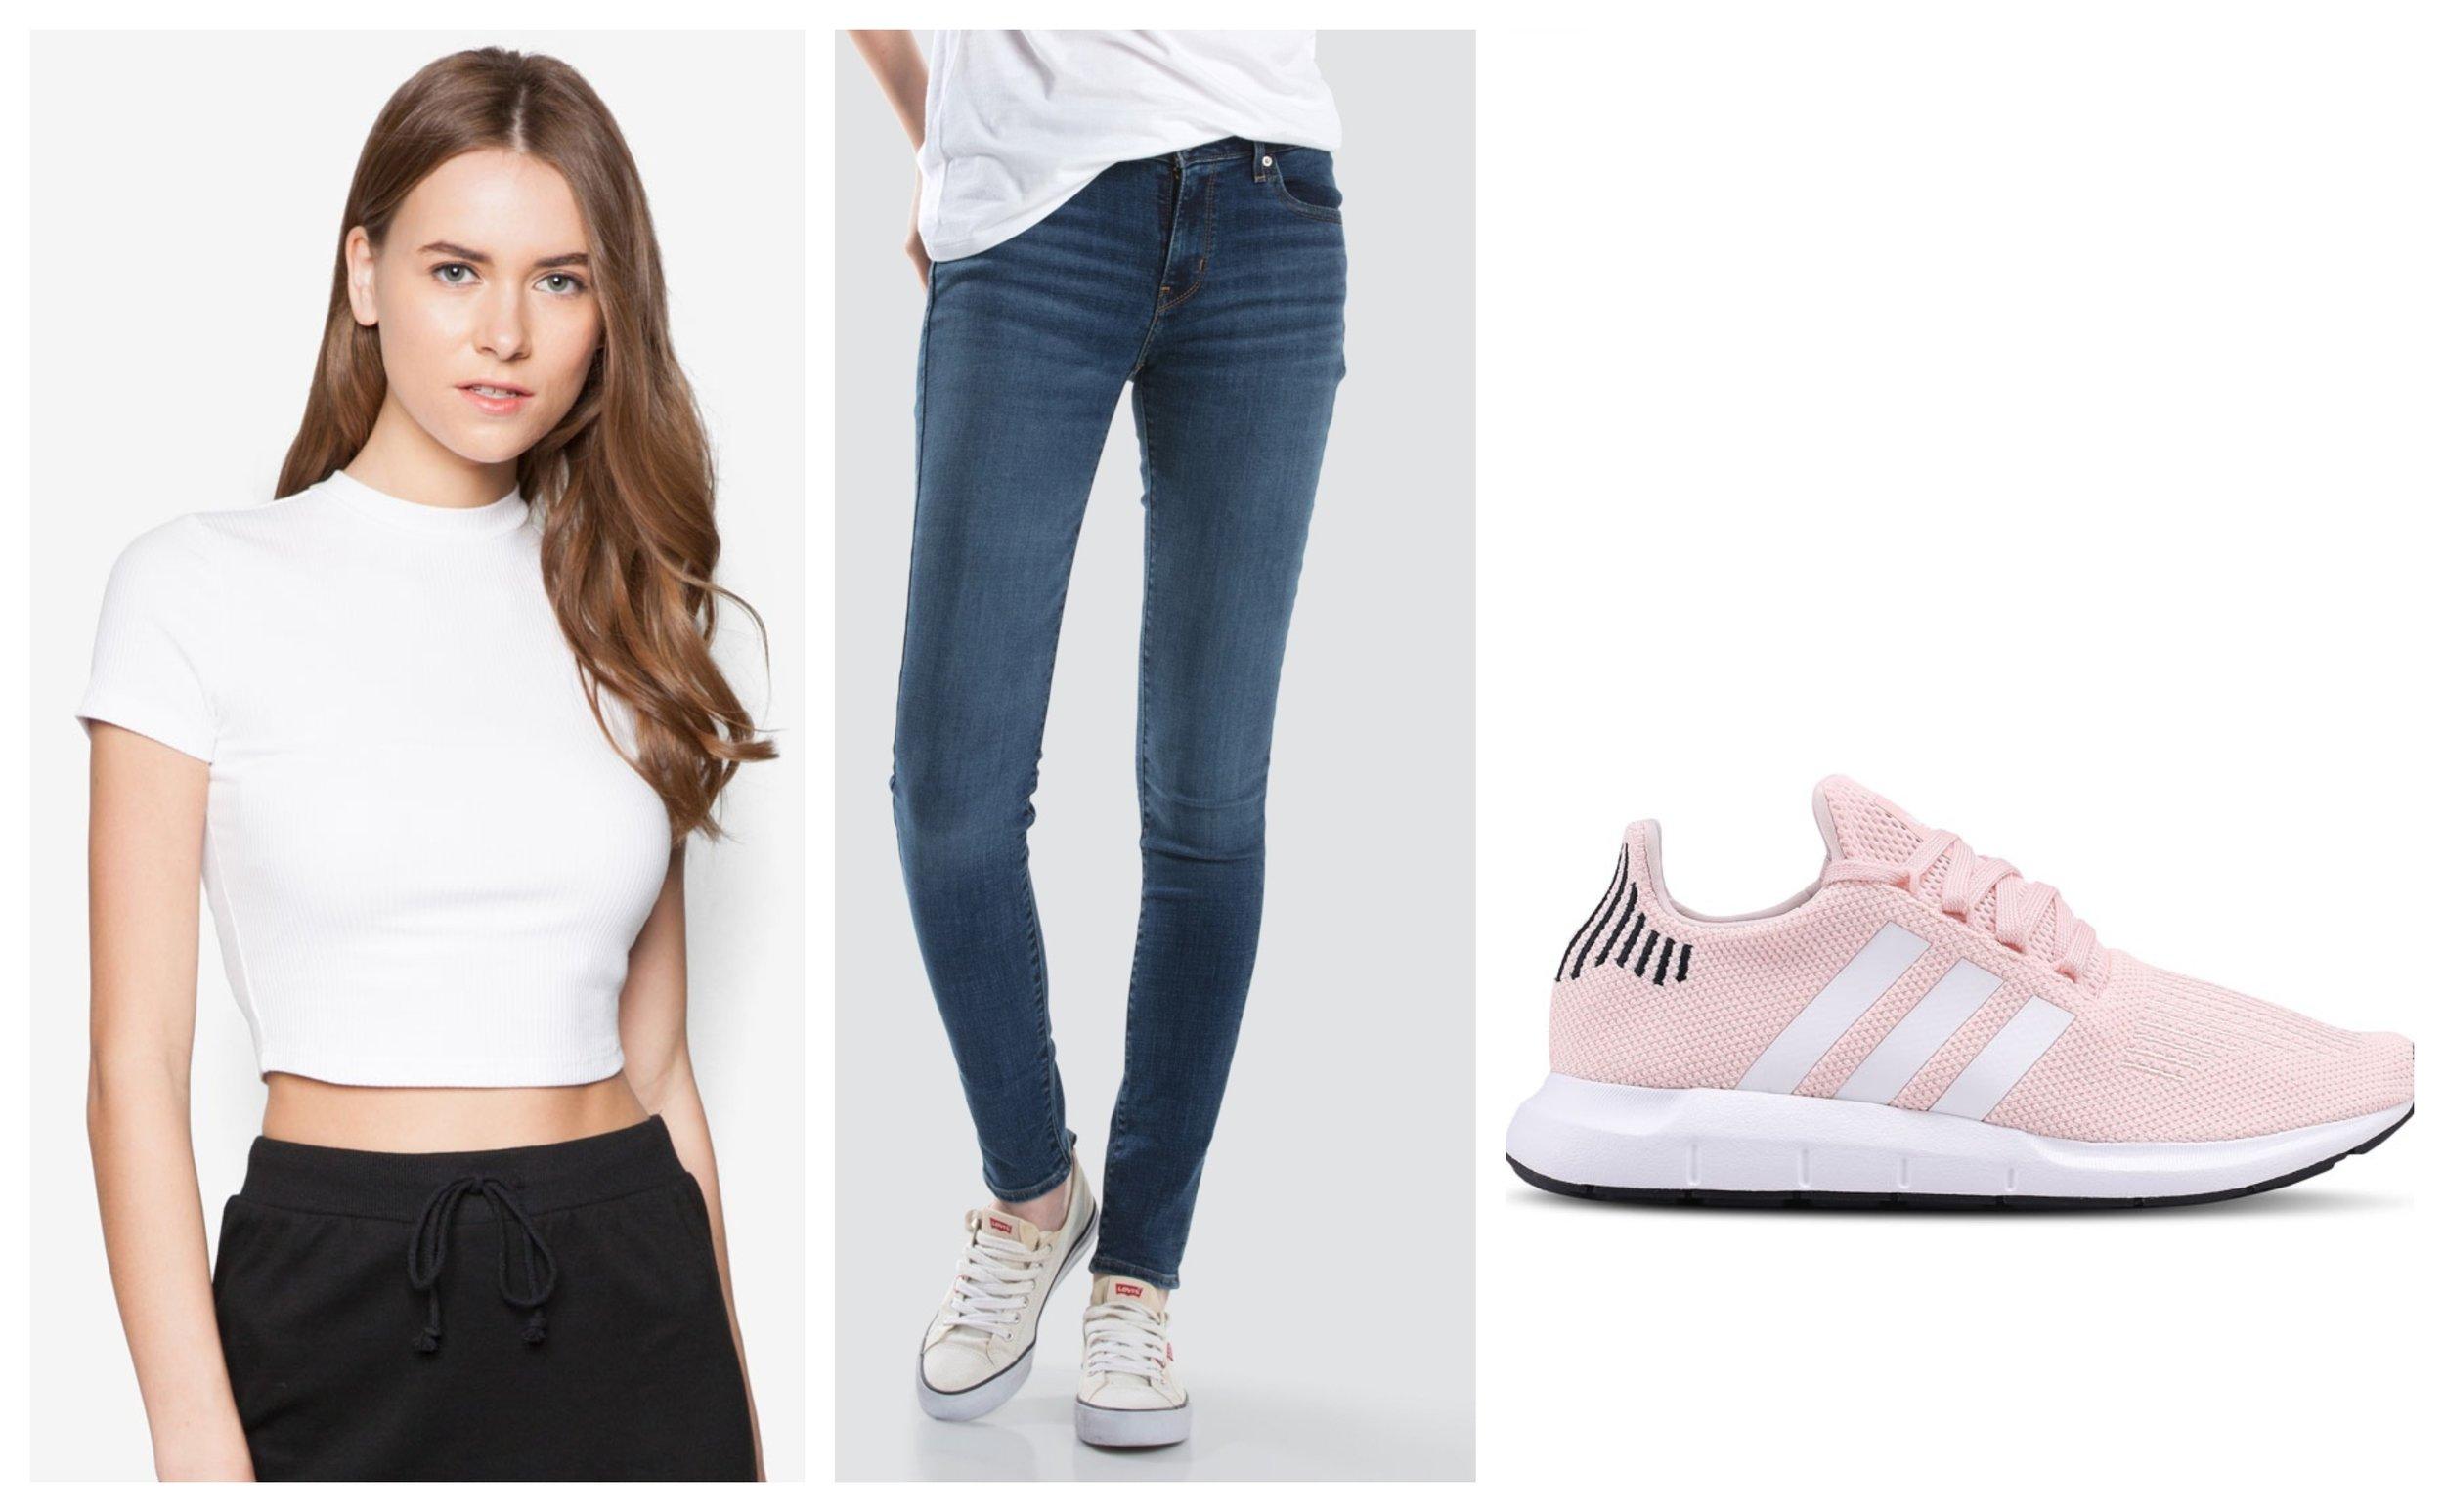 ZALORA Basic Ribbed High Neck Tee  I  Levi's 711 Skinny Jeans Women I  Adidas Originals Swift Run Sneakers